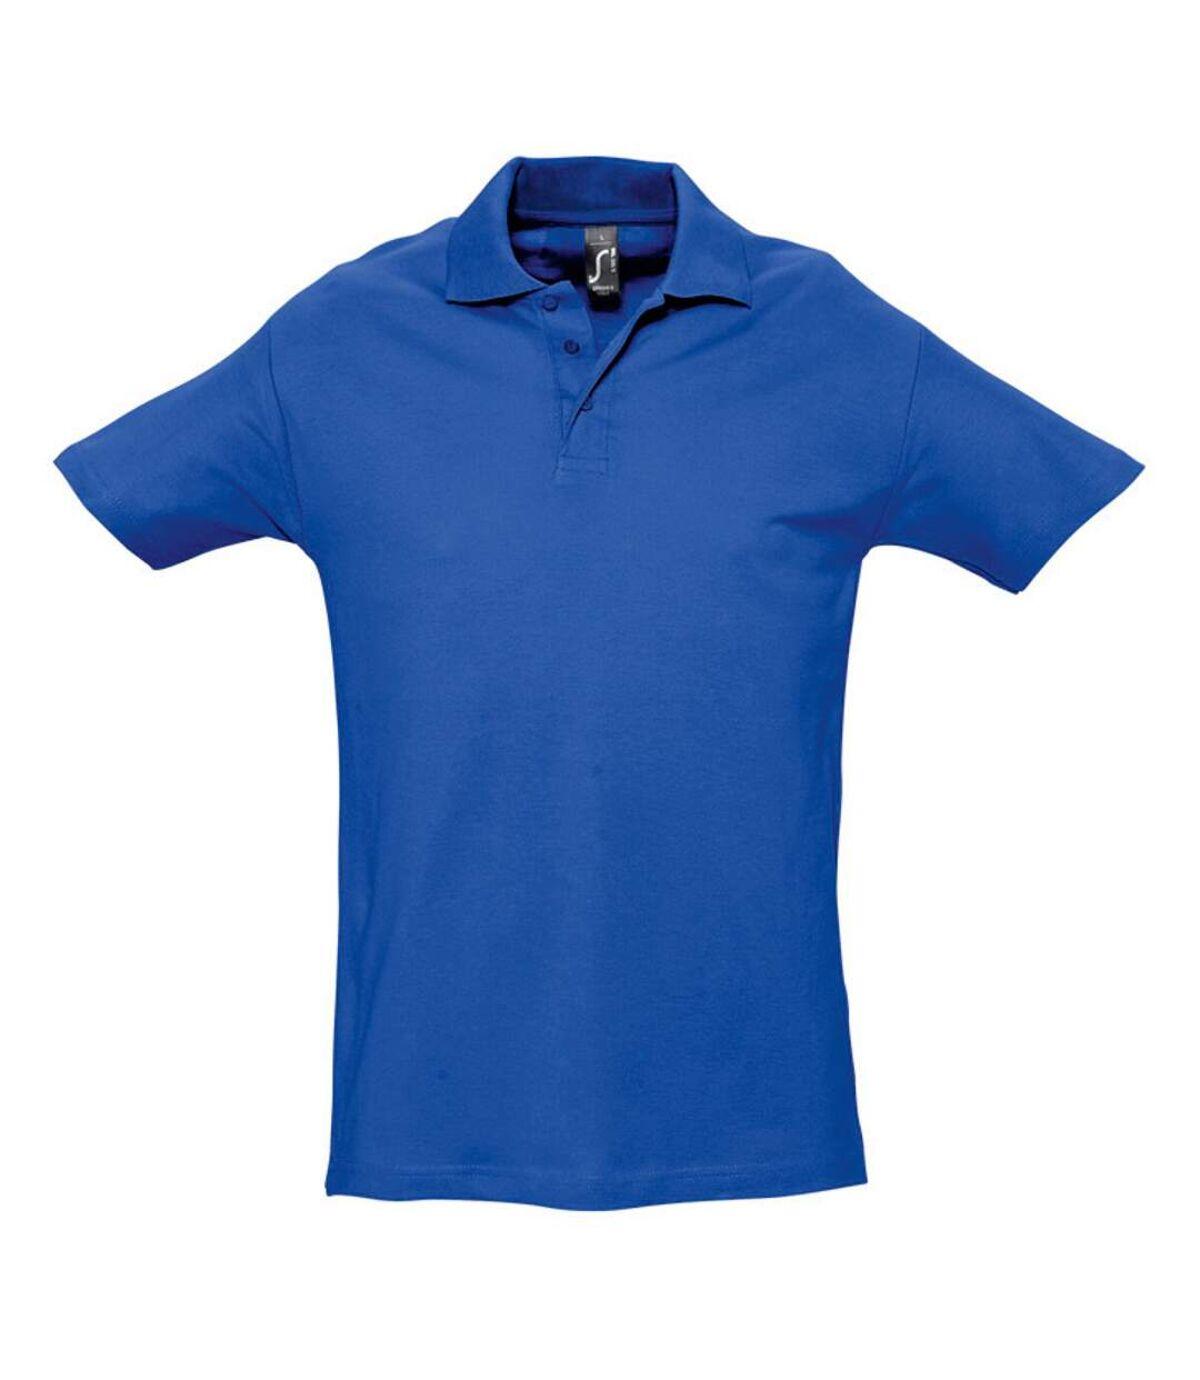 SOLS Mens Spring II Short Sleeve Heavyweight Polo Shirt (Royal Blue) - UTPC320